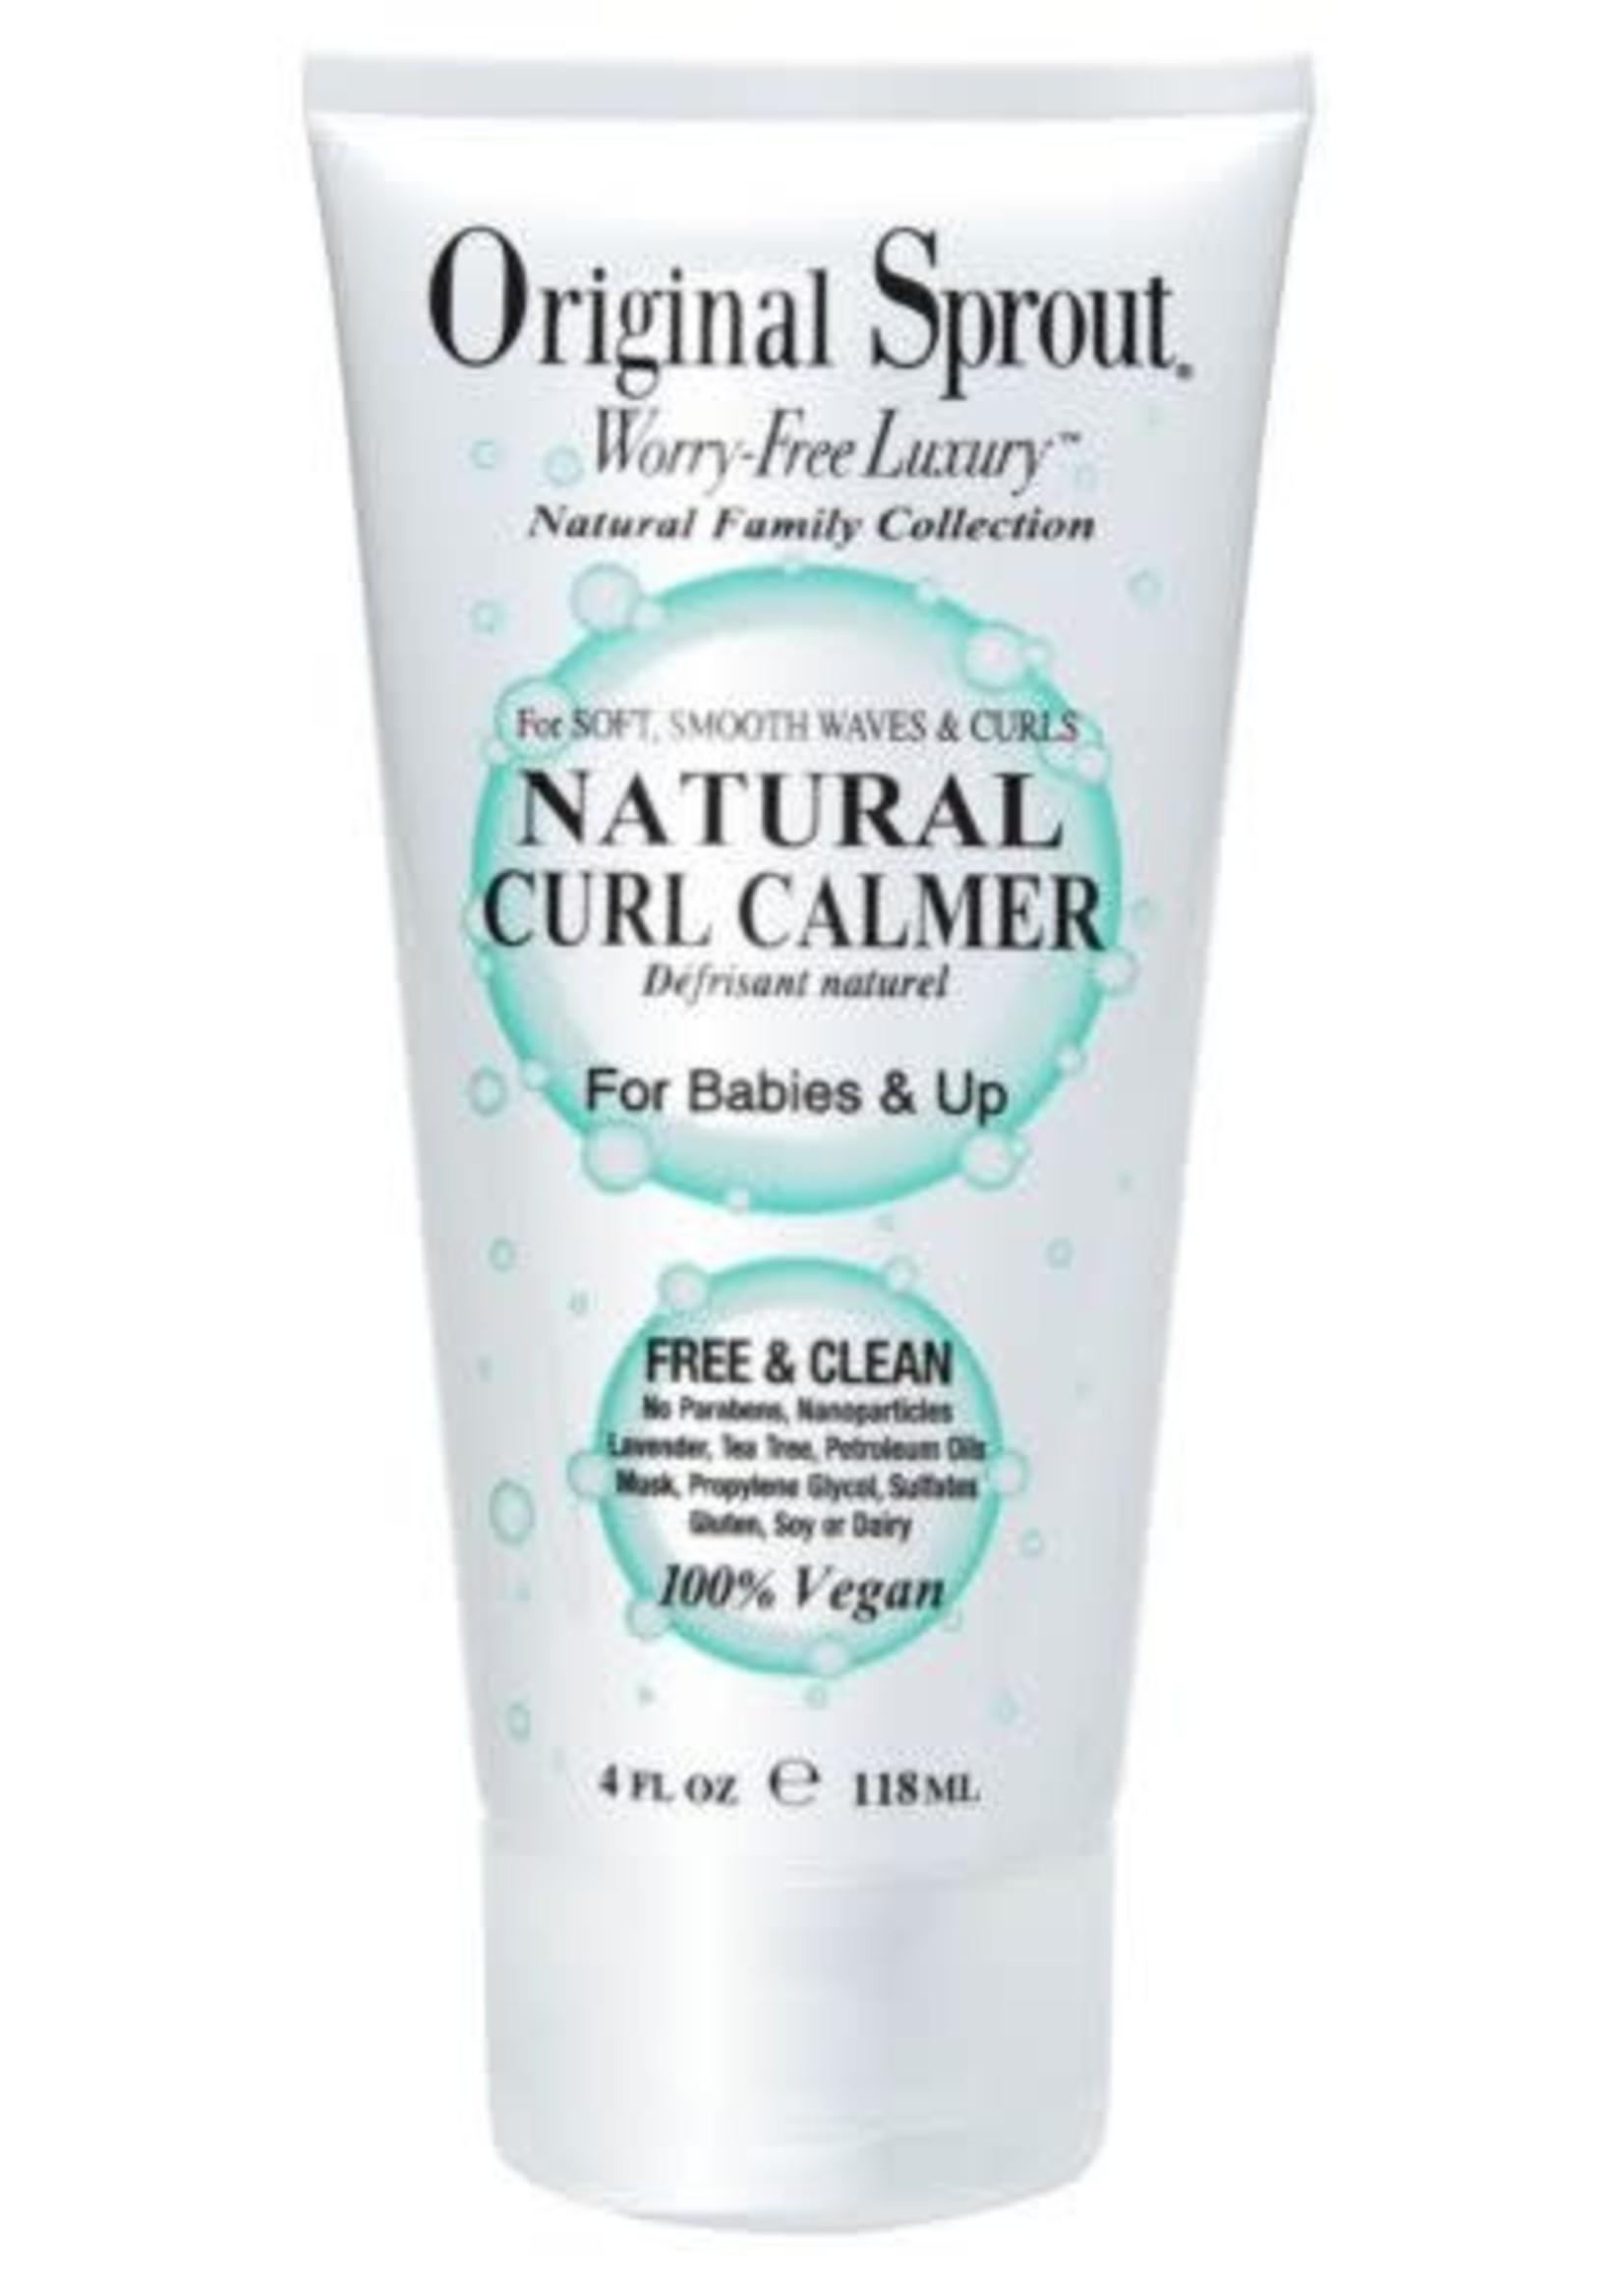 original sprout Original sprout natural curl calmer-4oz